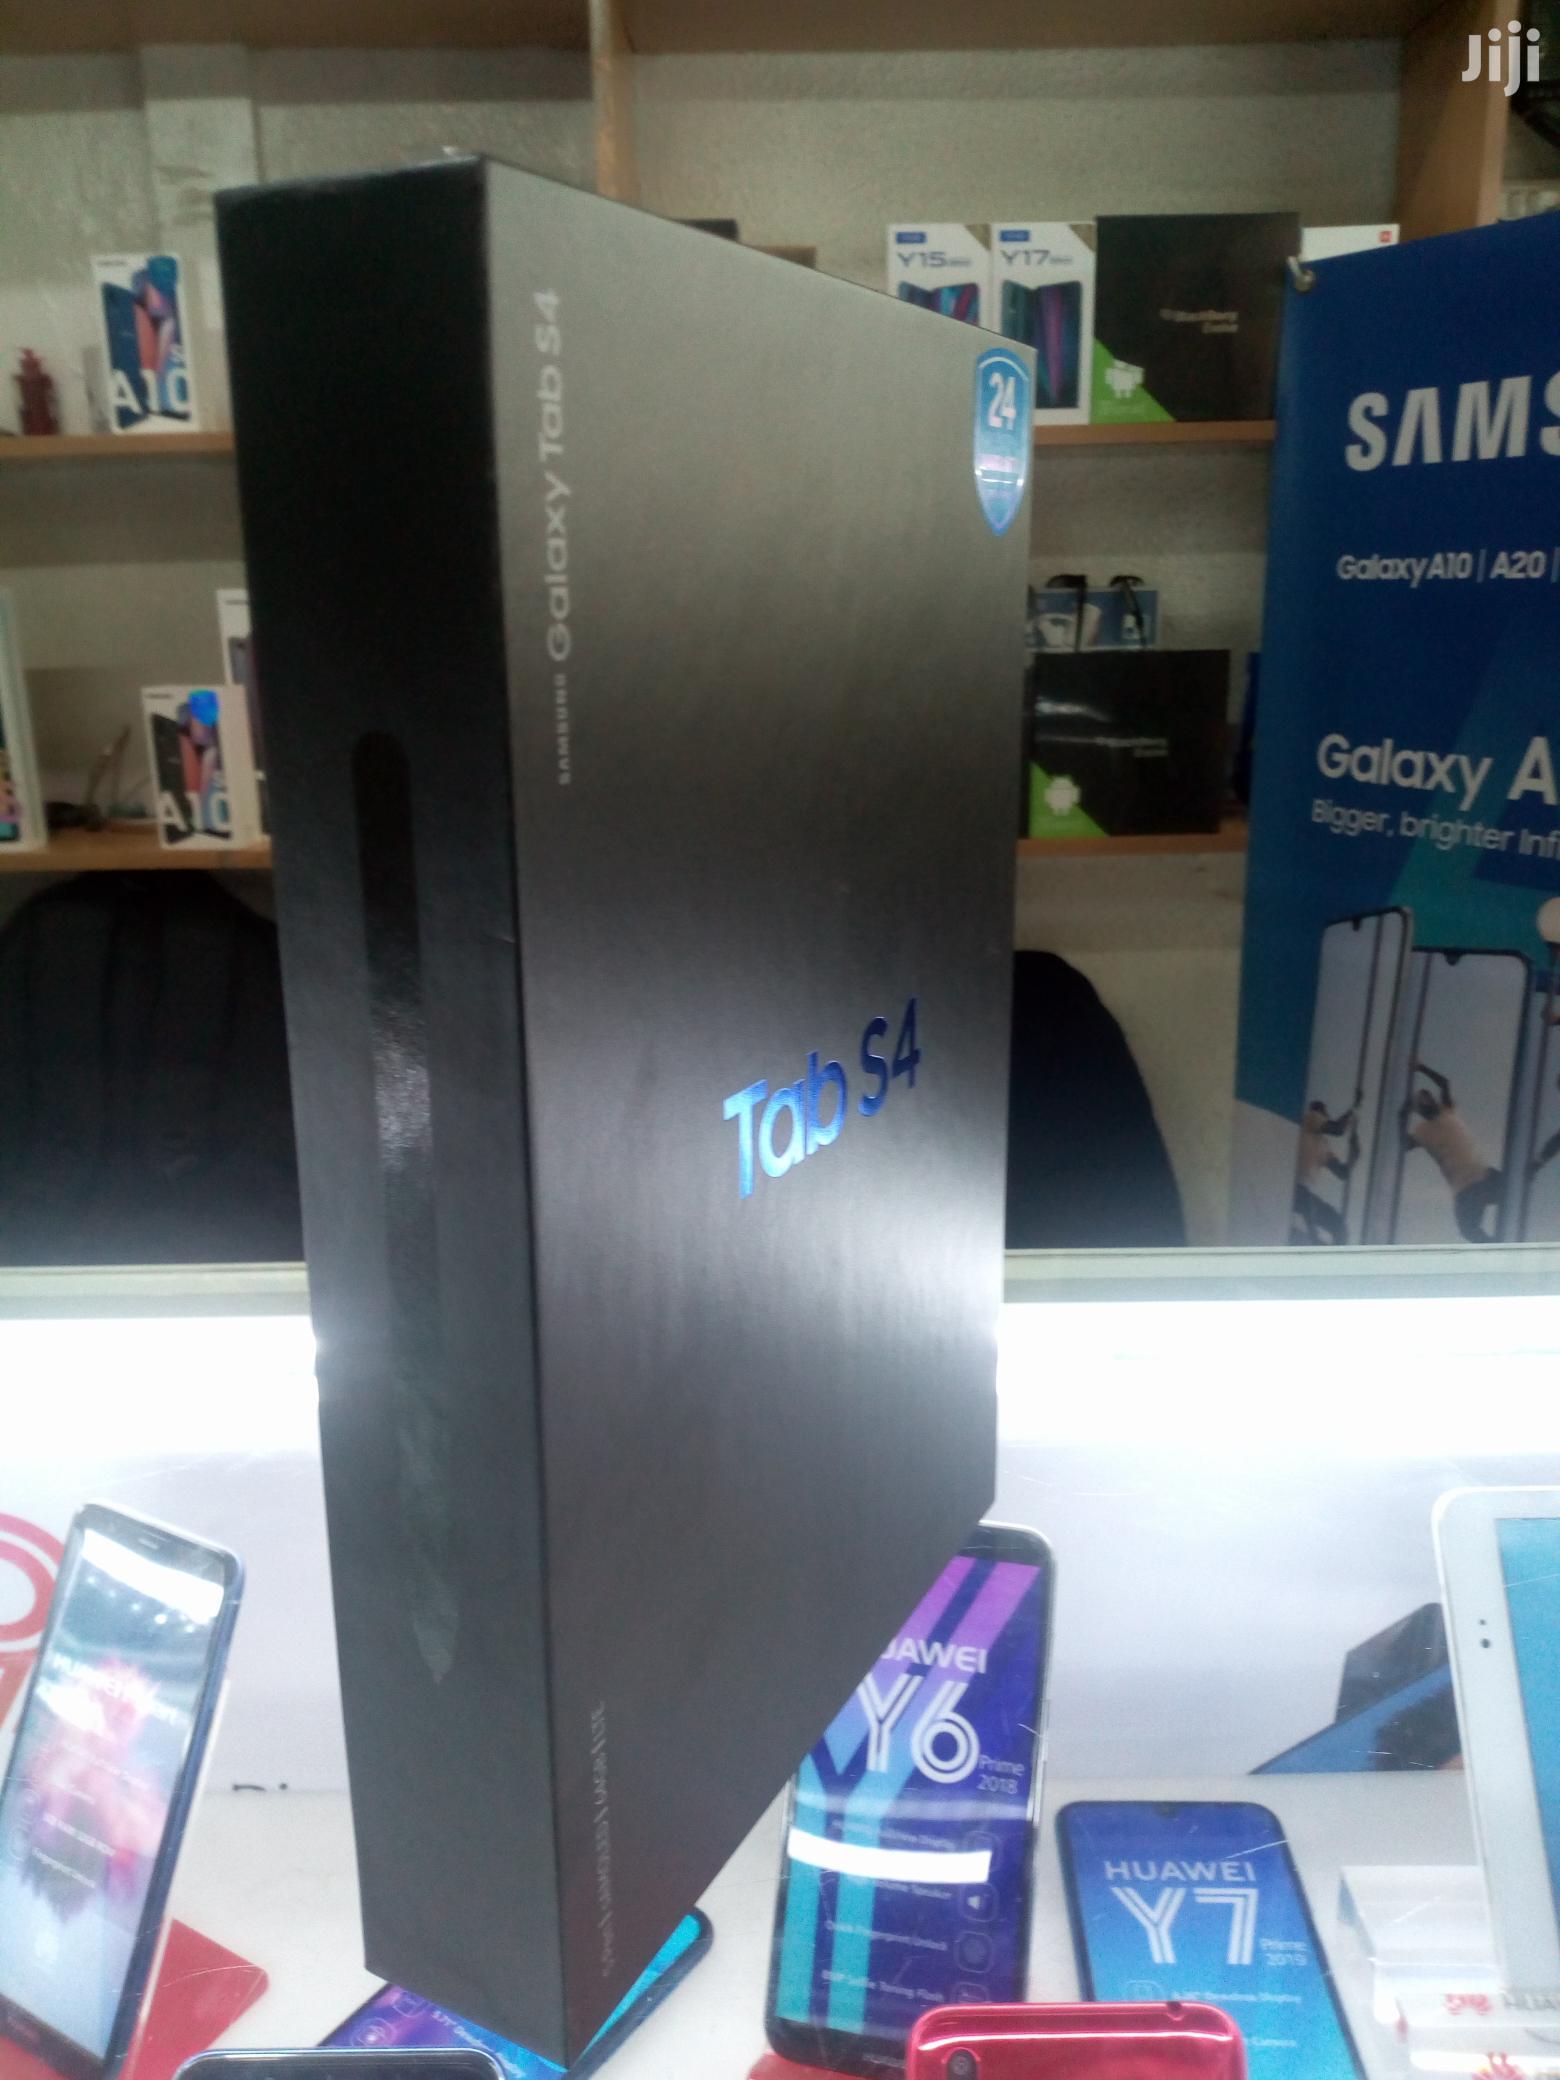 New Samsung Galaxy Tab S4 64 GB Black